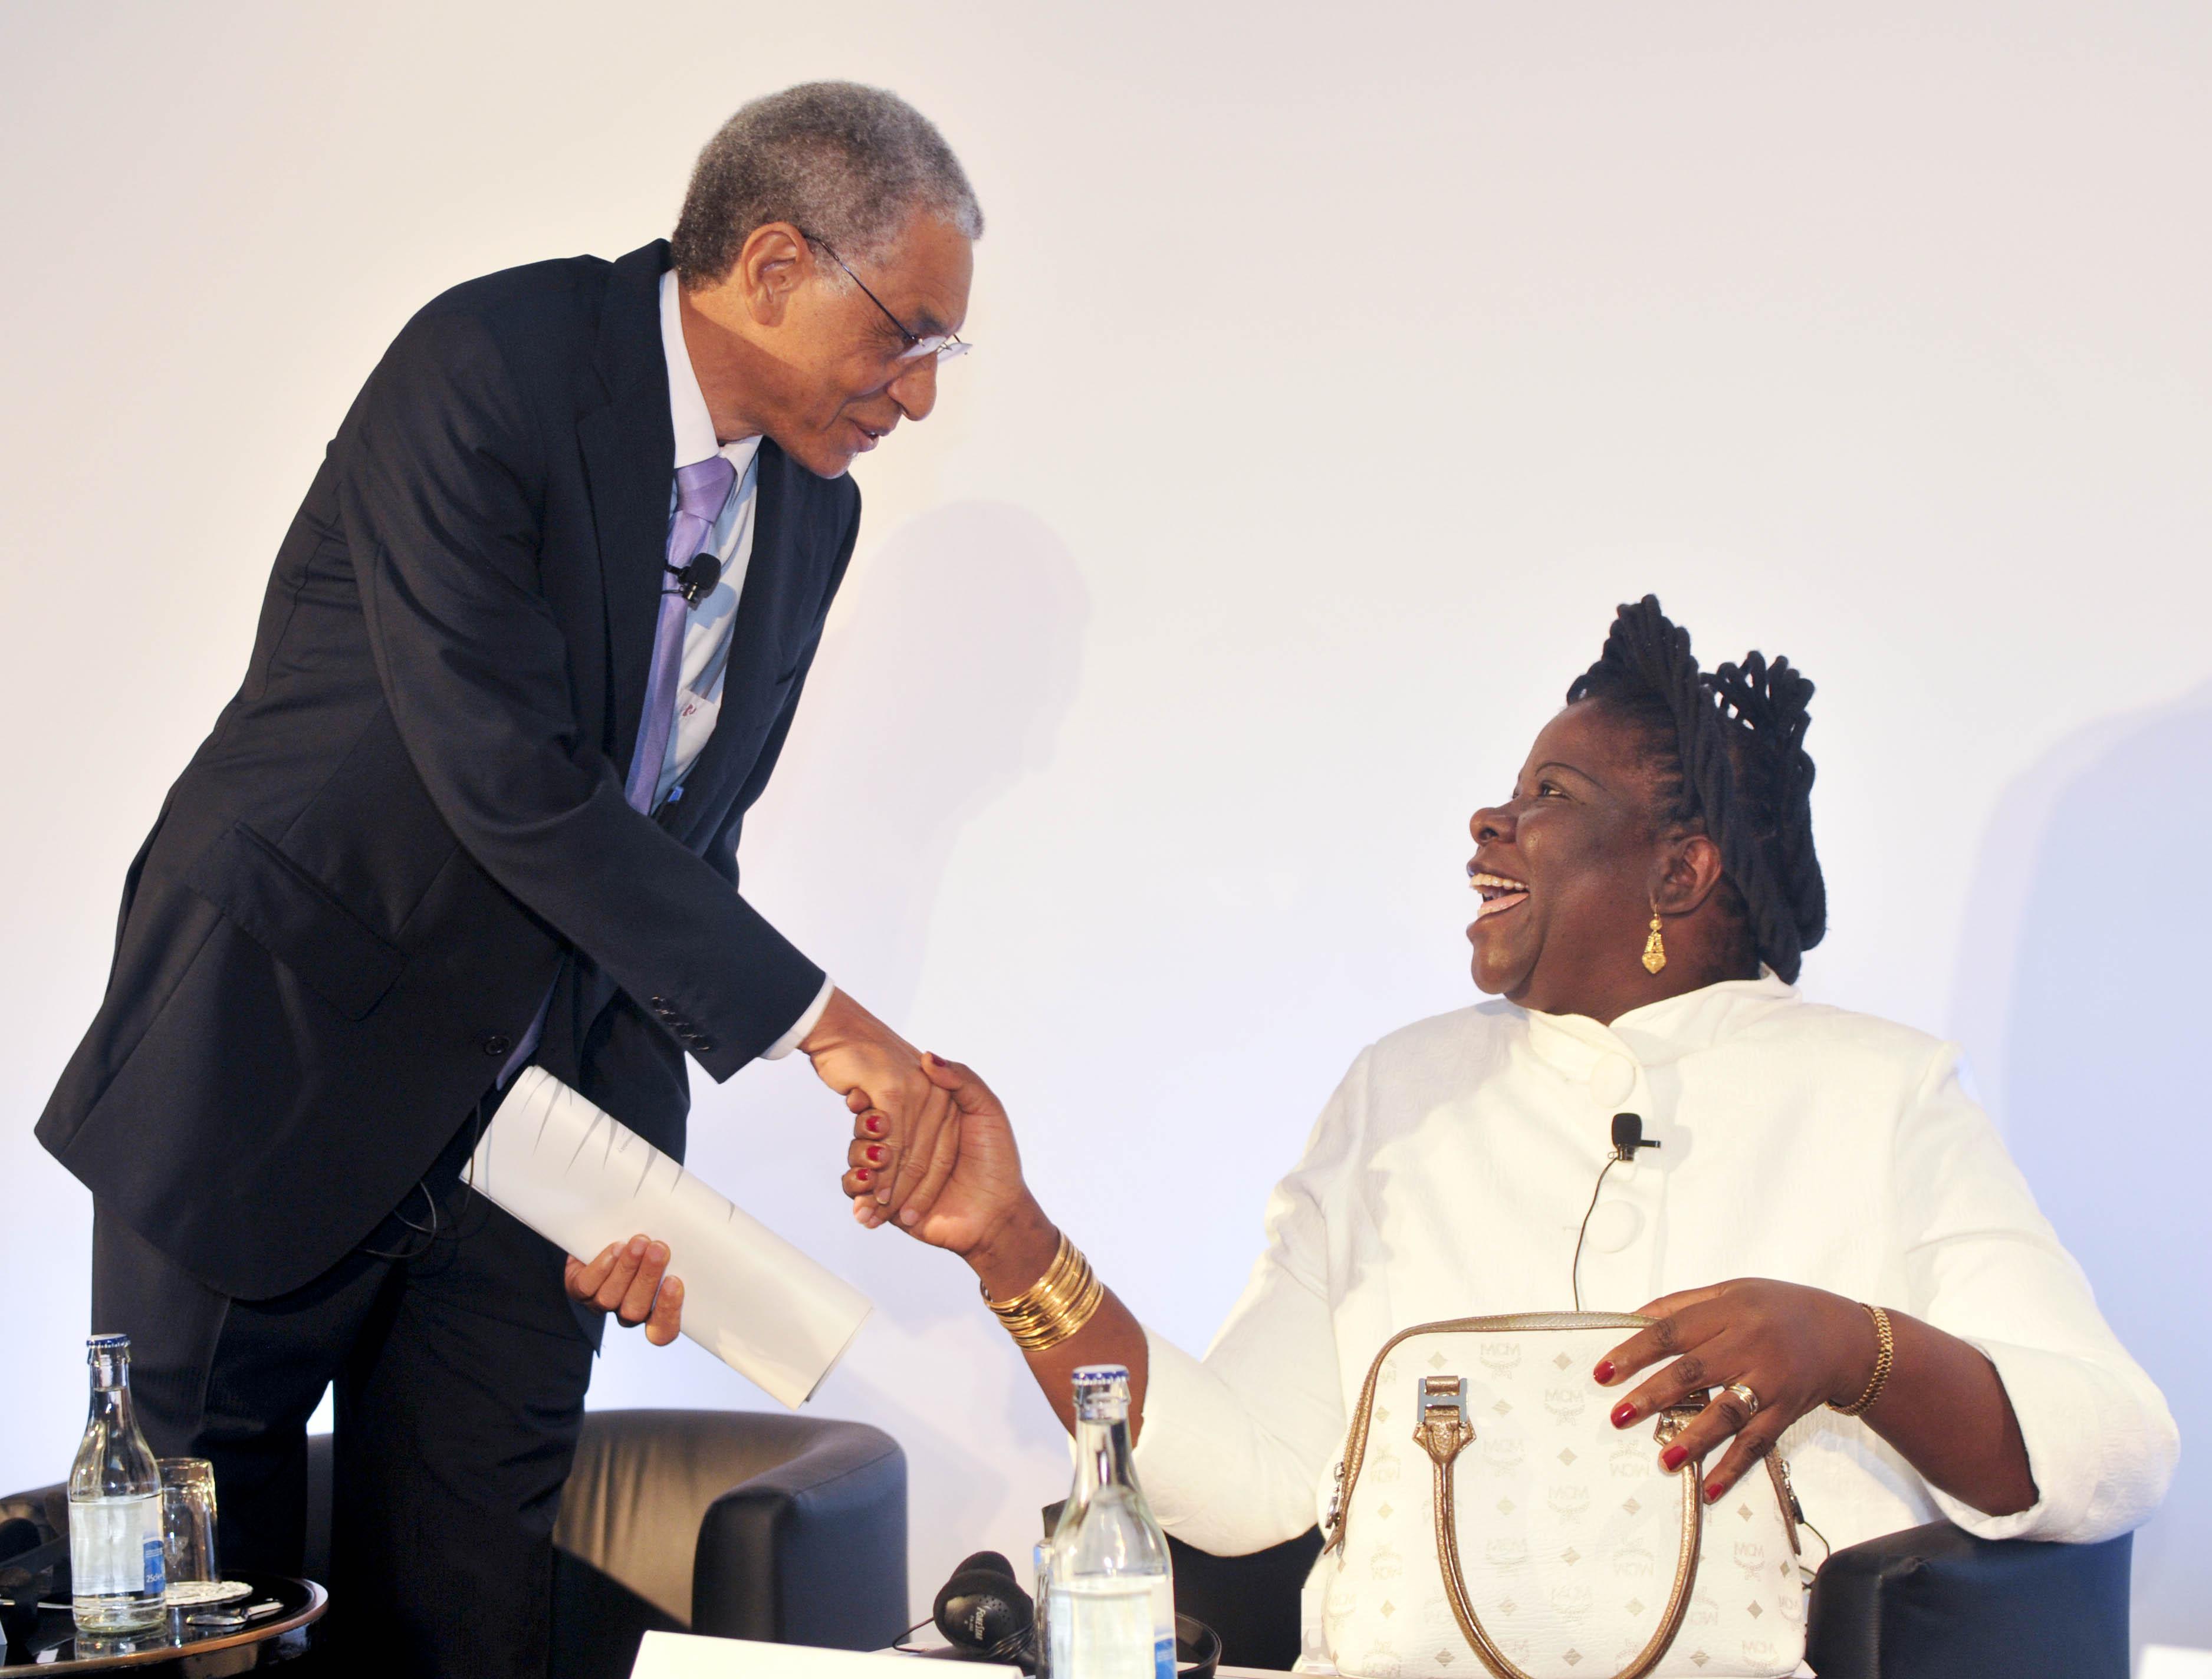 Fileluisa dias diogo prime minister of mozambique greeting adao fileluisa dias diogo prime minister of mozambique greeting adao rocha senior m4hsunfo